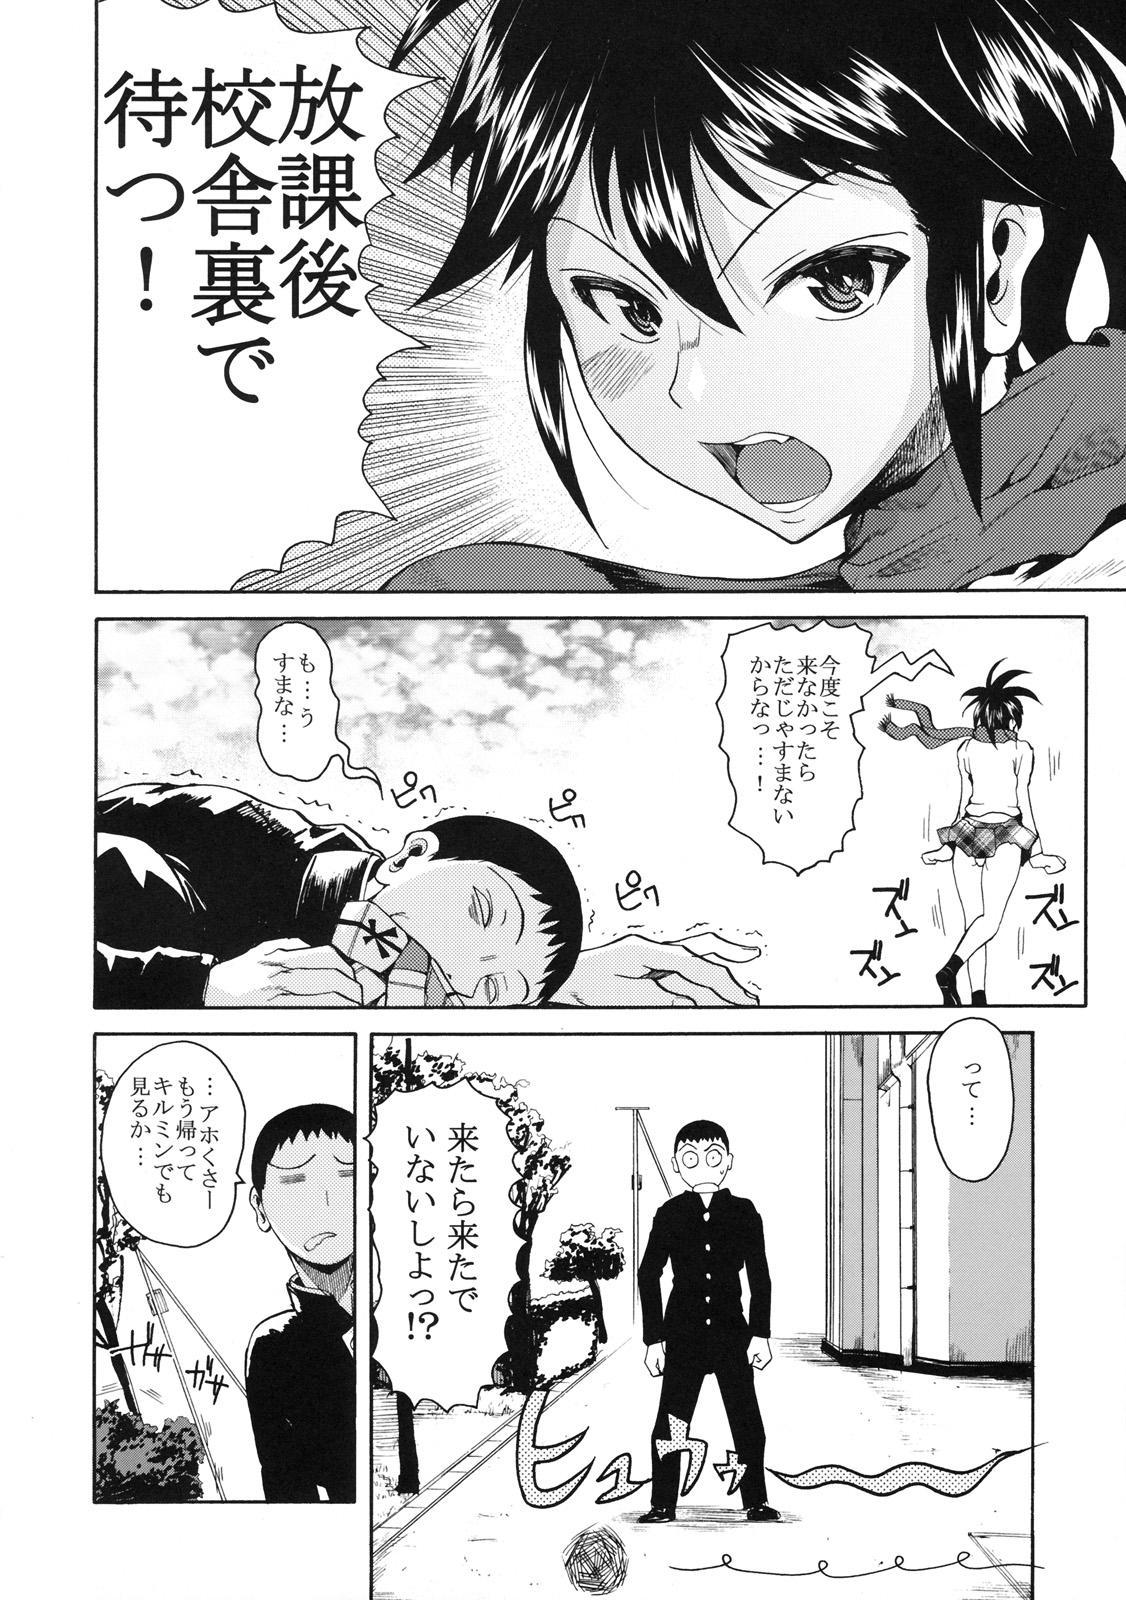 Shinzui Valentine Special Vol. 1 6